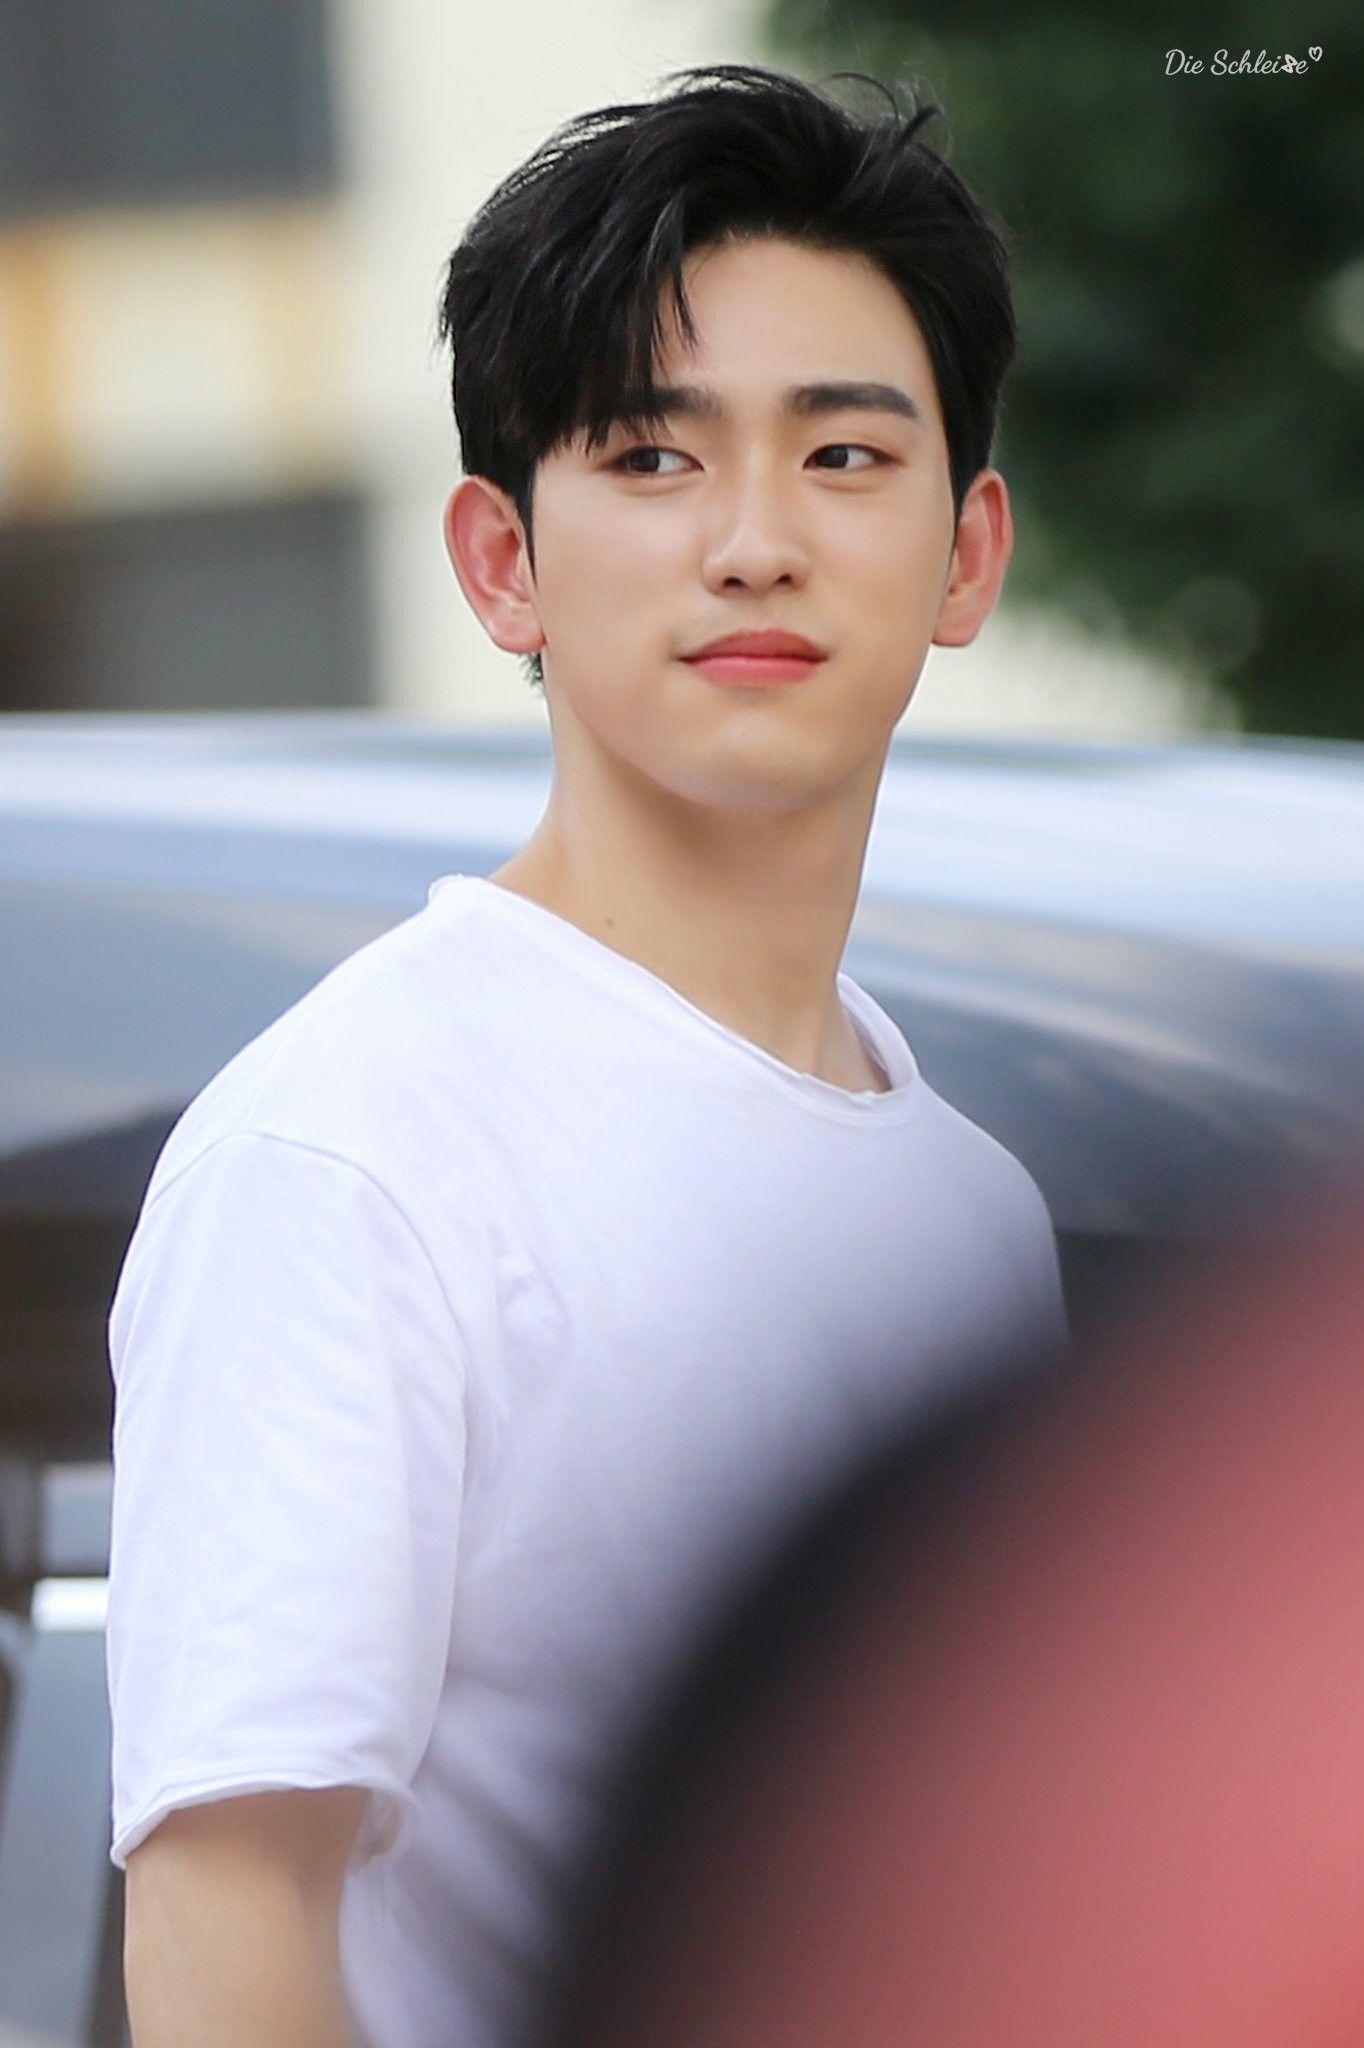 jinyoung #jinyounggot7 #got7 #got7jinyoung | Got7 jinyoung, Jinyoung, Got7